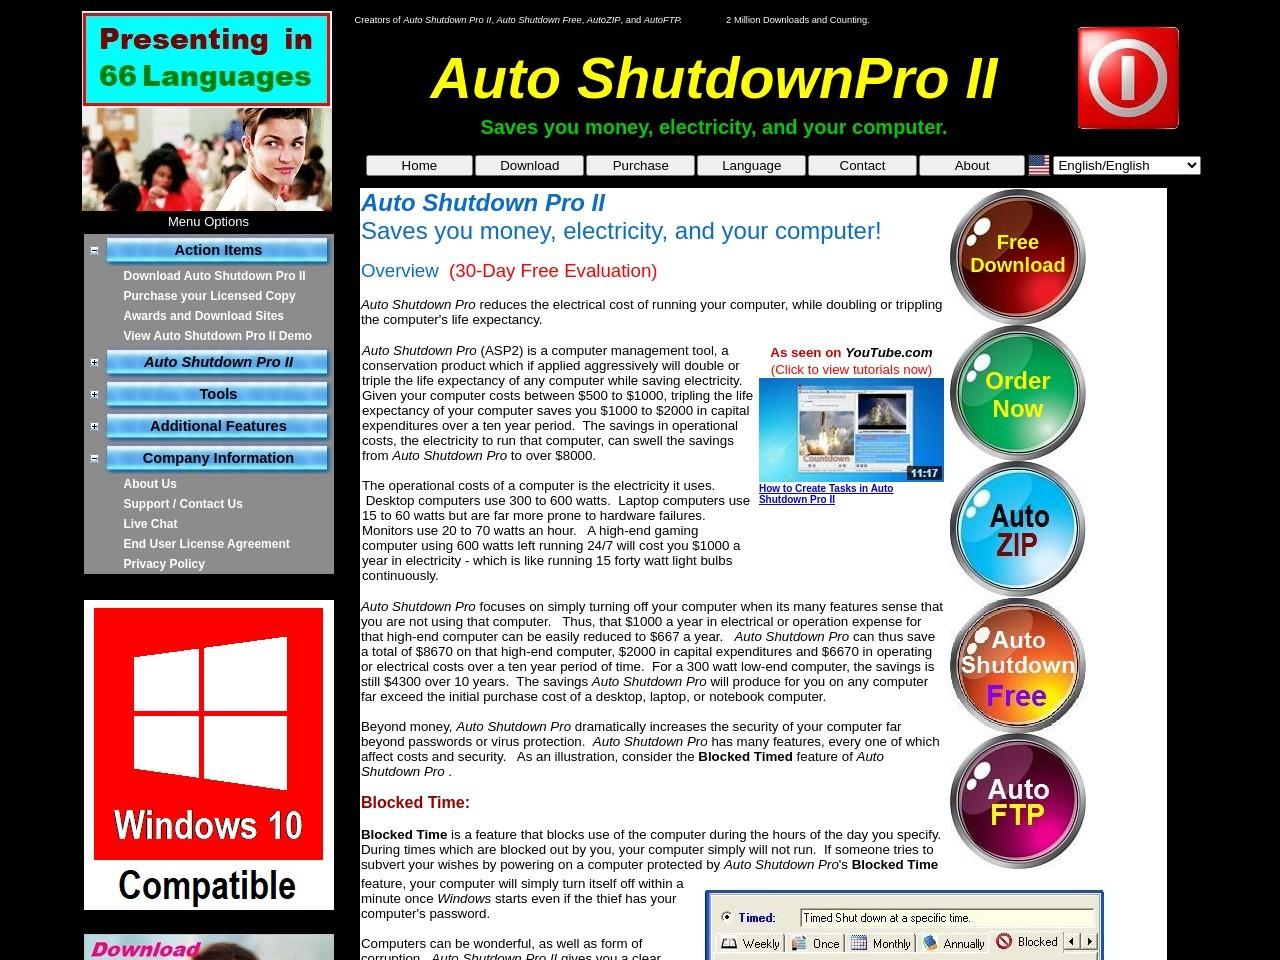 Auto Shutdown Pro